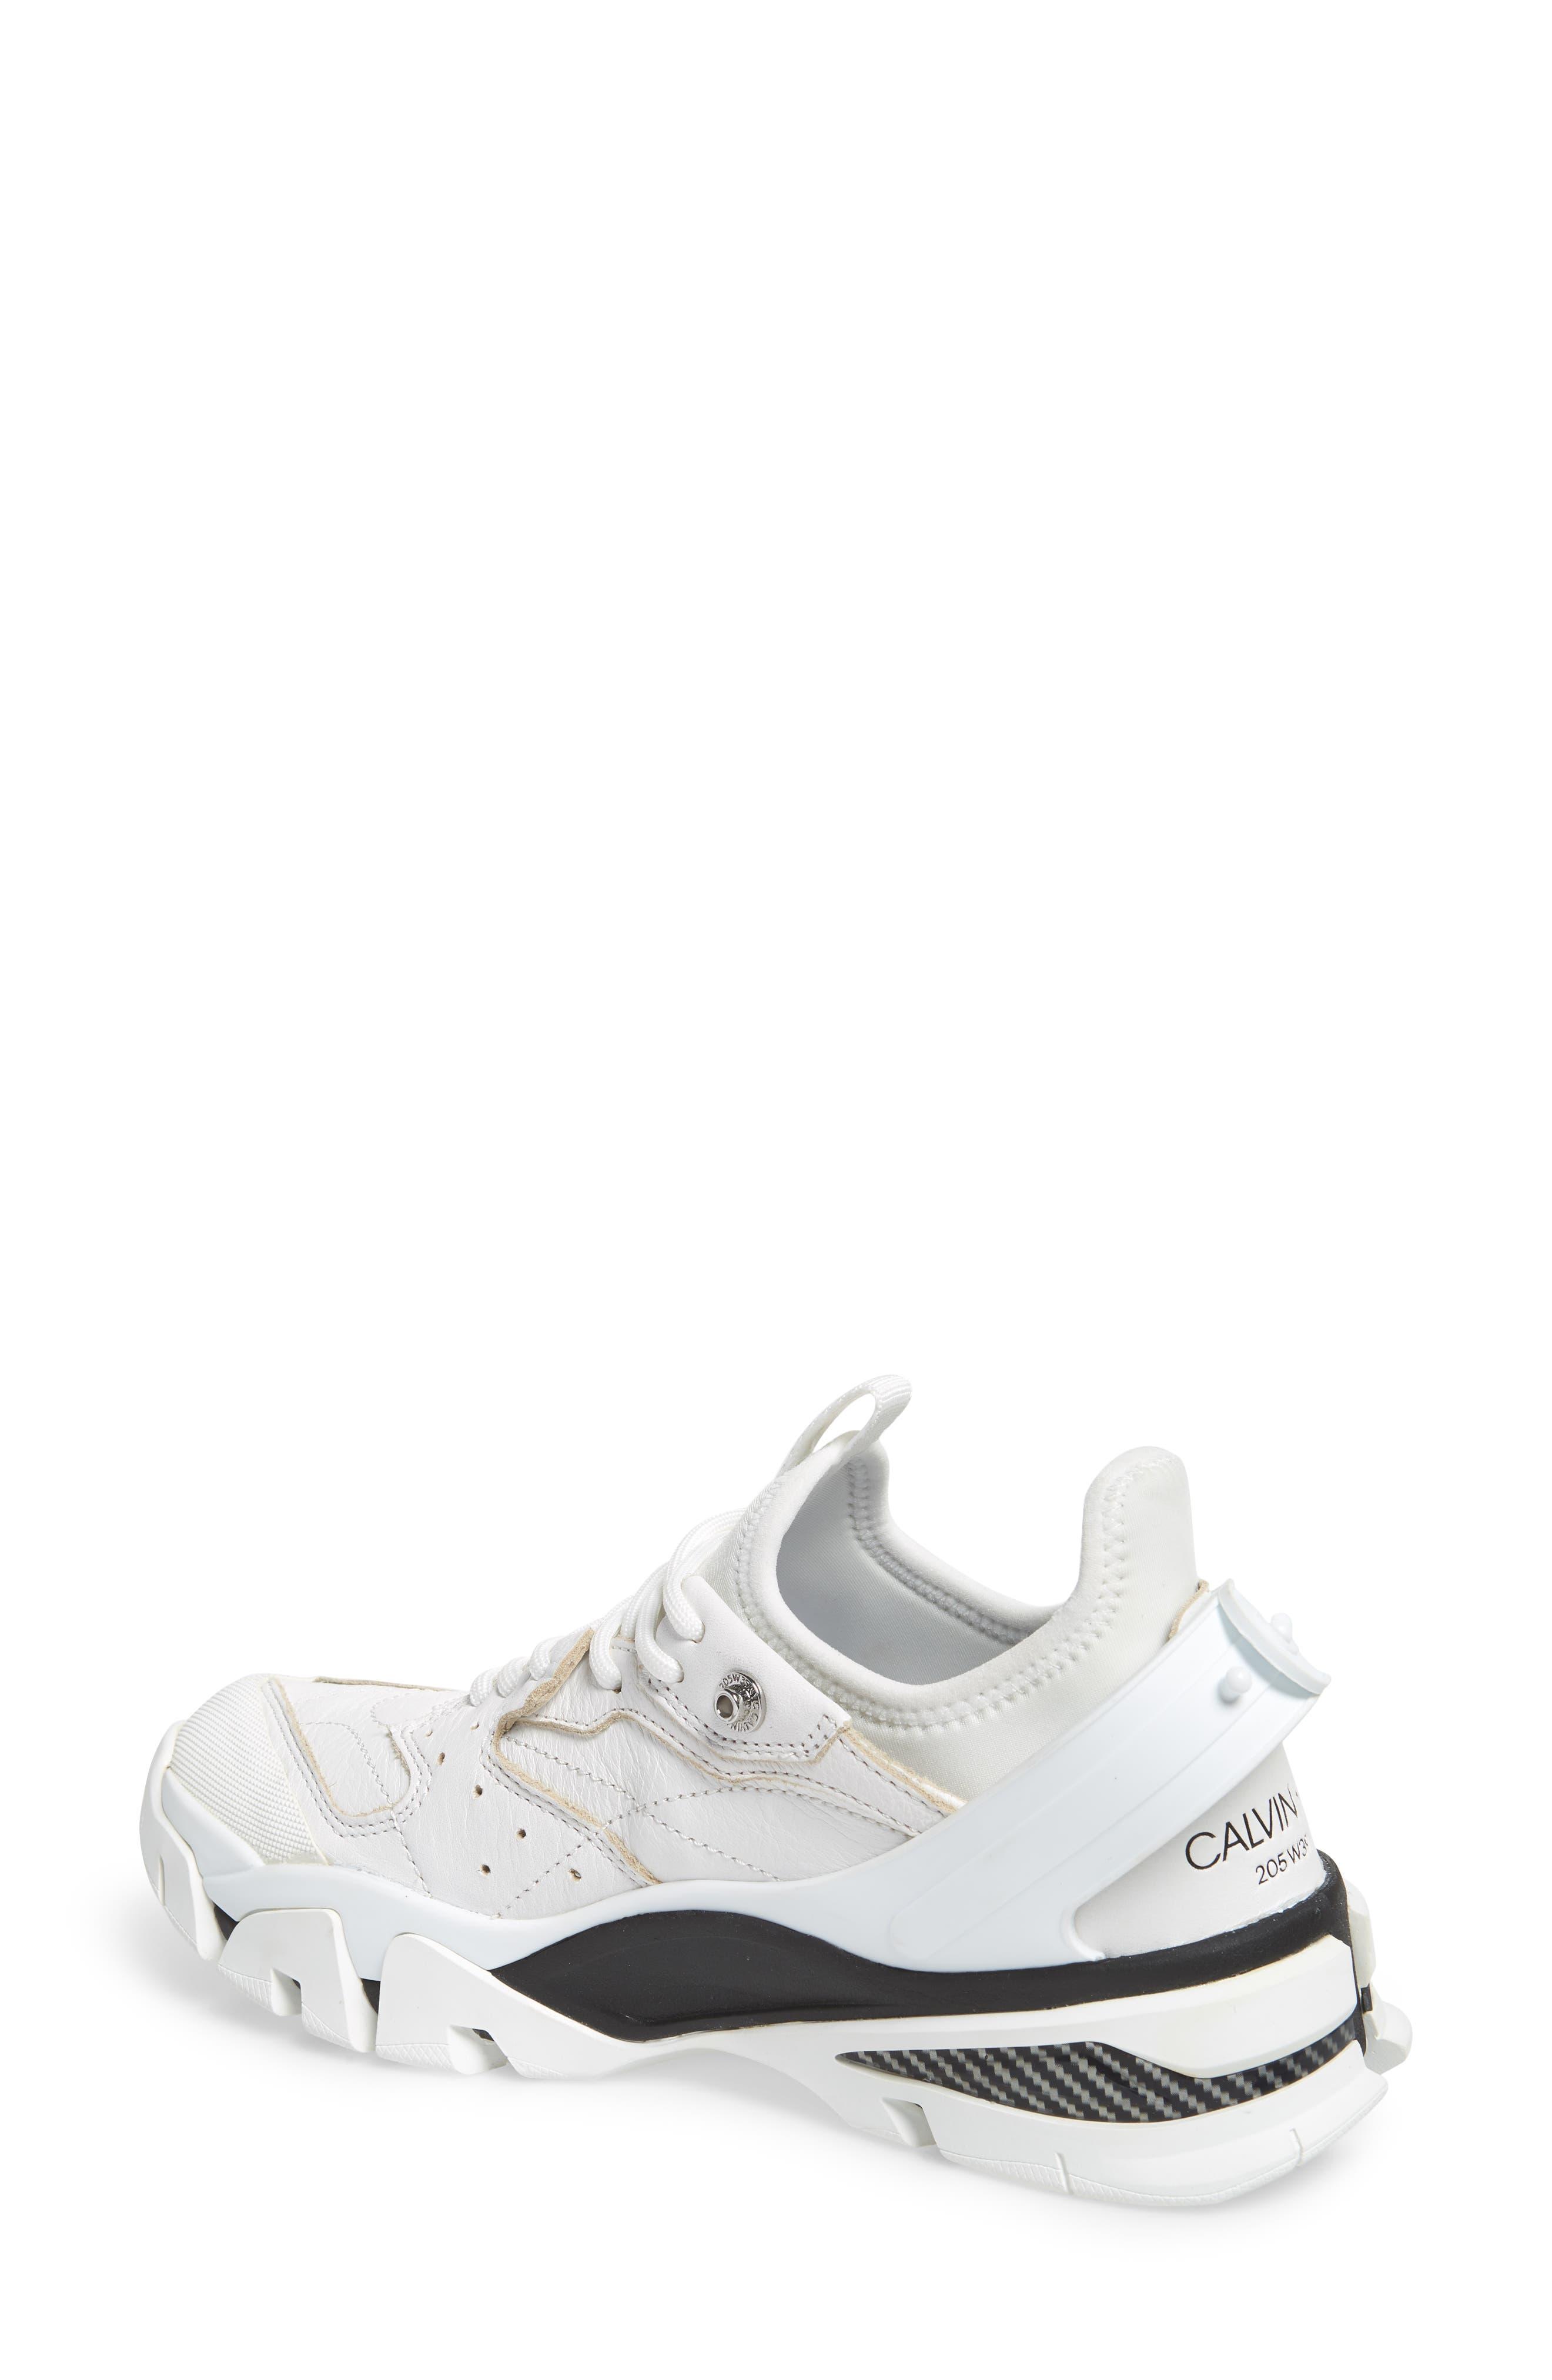 CALVIN KLEIN, 205W39NYC Carla Sneaker, Alternate thumbnail 2, color, WHITE/ BLACK/ BLACK